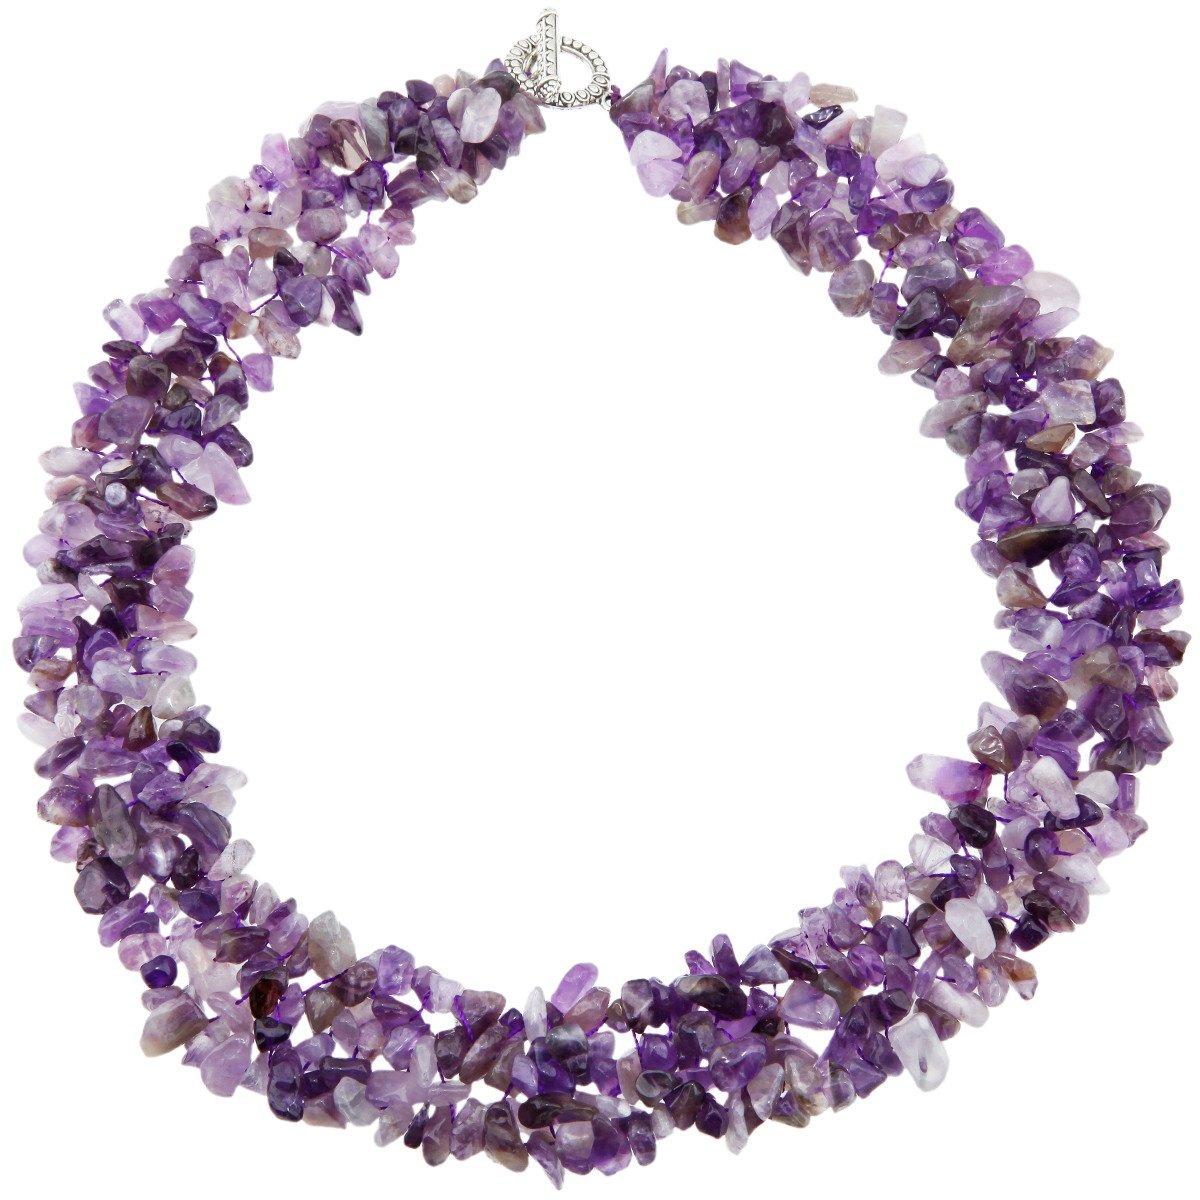 SUNYIK Purple Amethyst Tumbled Stone Bib Necklace Collar Choker Strands 17.5 inches